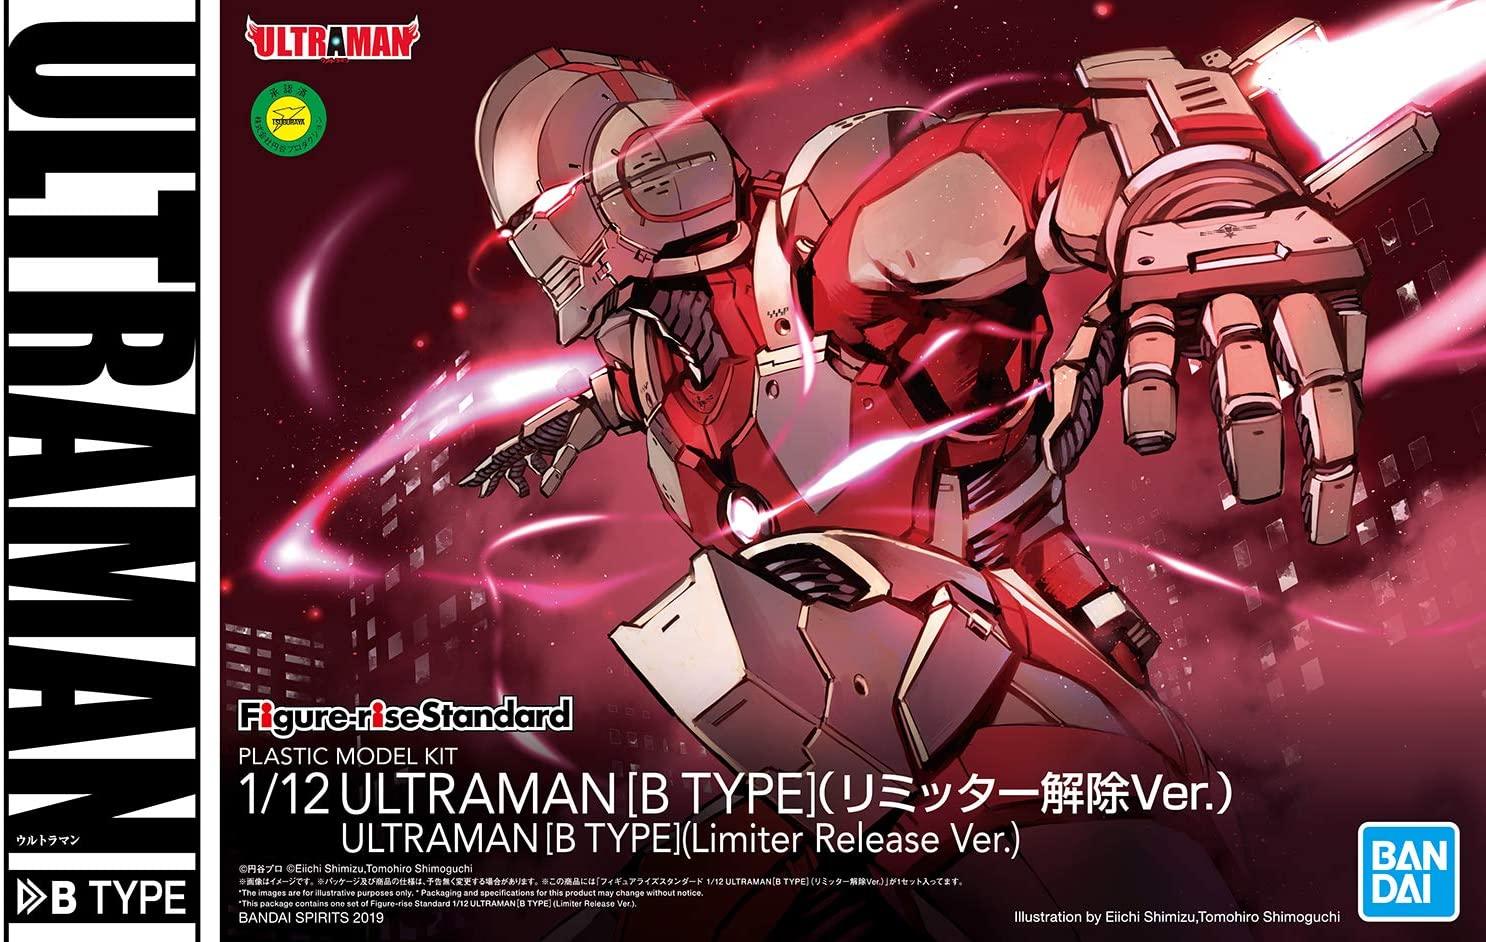 BANDAI ULT69475 FIGURE RISE ULTRAMAN B TYPE LIMITED 1/12